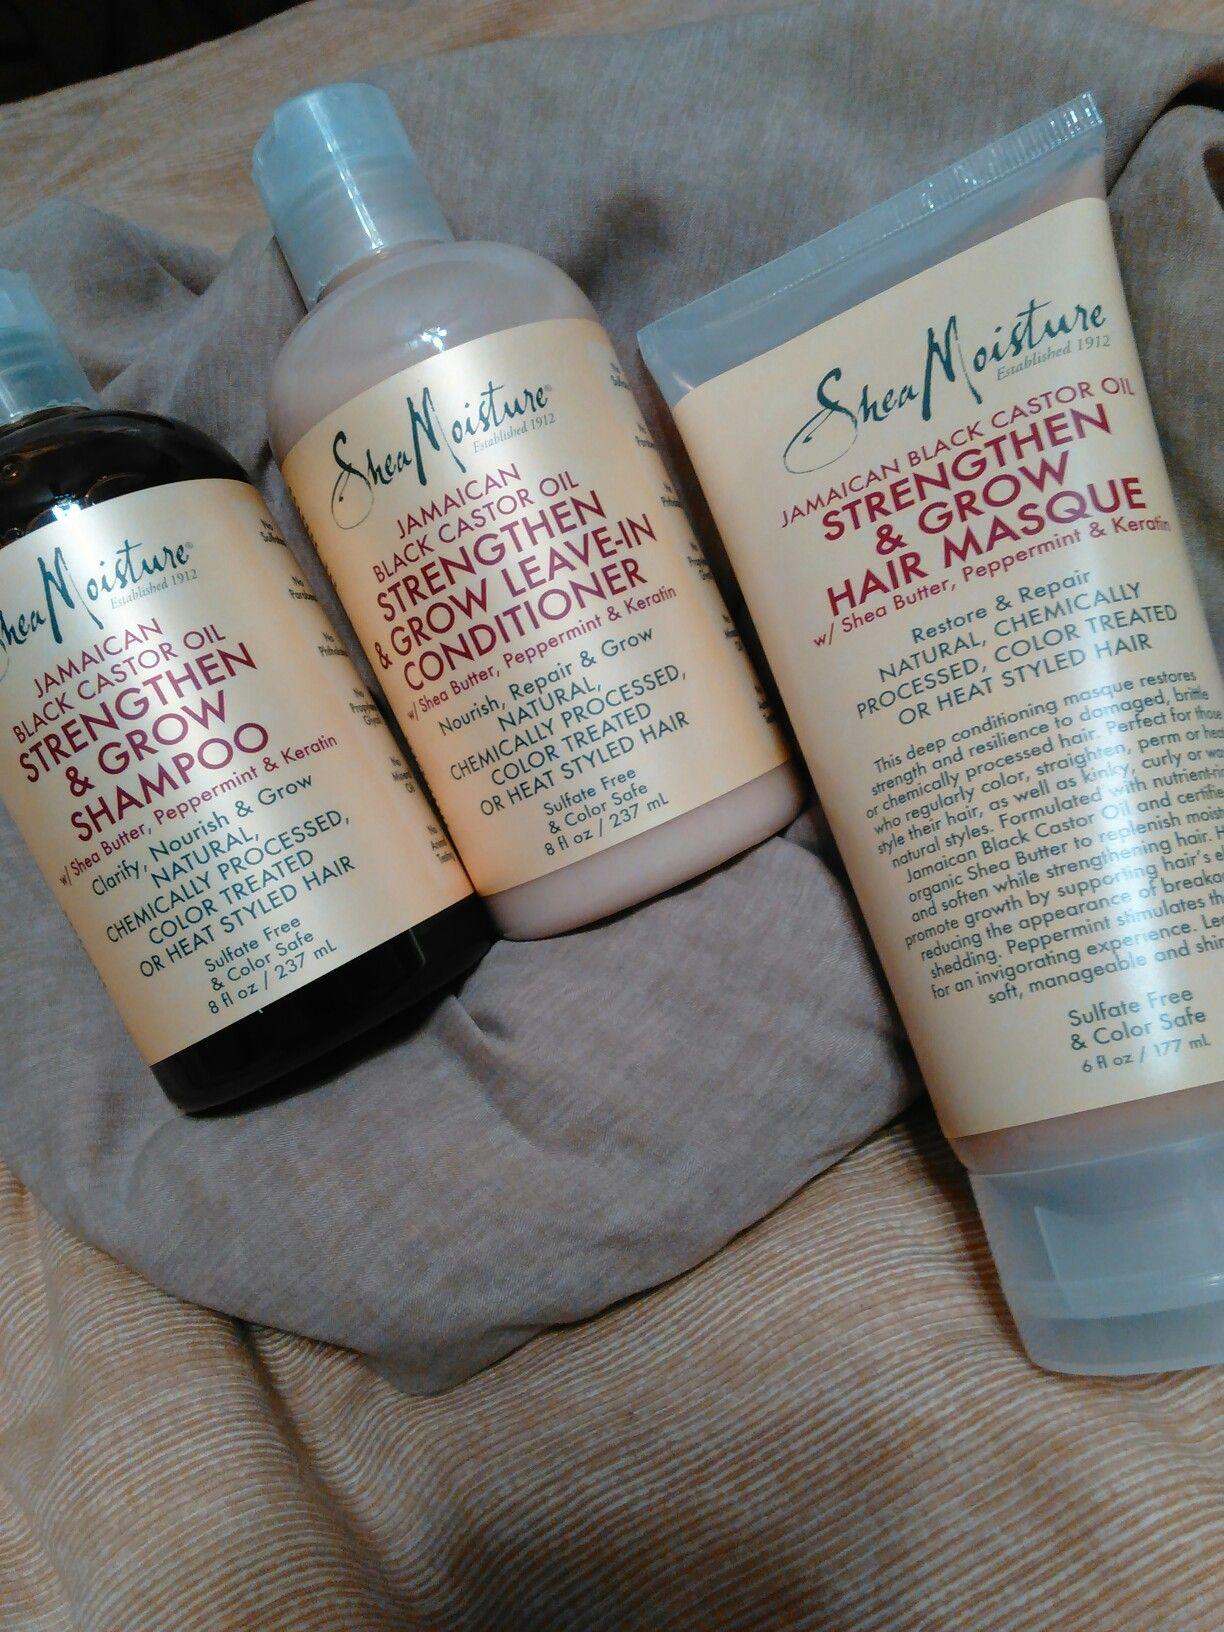 Shea Moisture Jamaican Black Castor Oil Strengthen Grow W Shea Butter Peppermint Ke Shea Moisture Products Natural Hair Styles Natural Hair Growth Tips